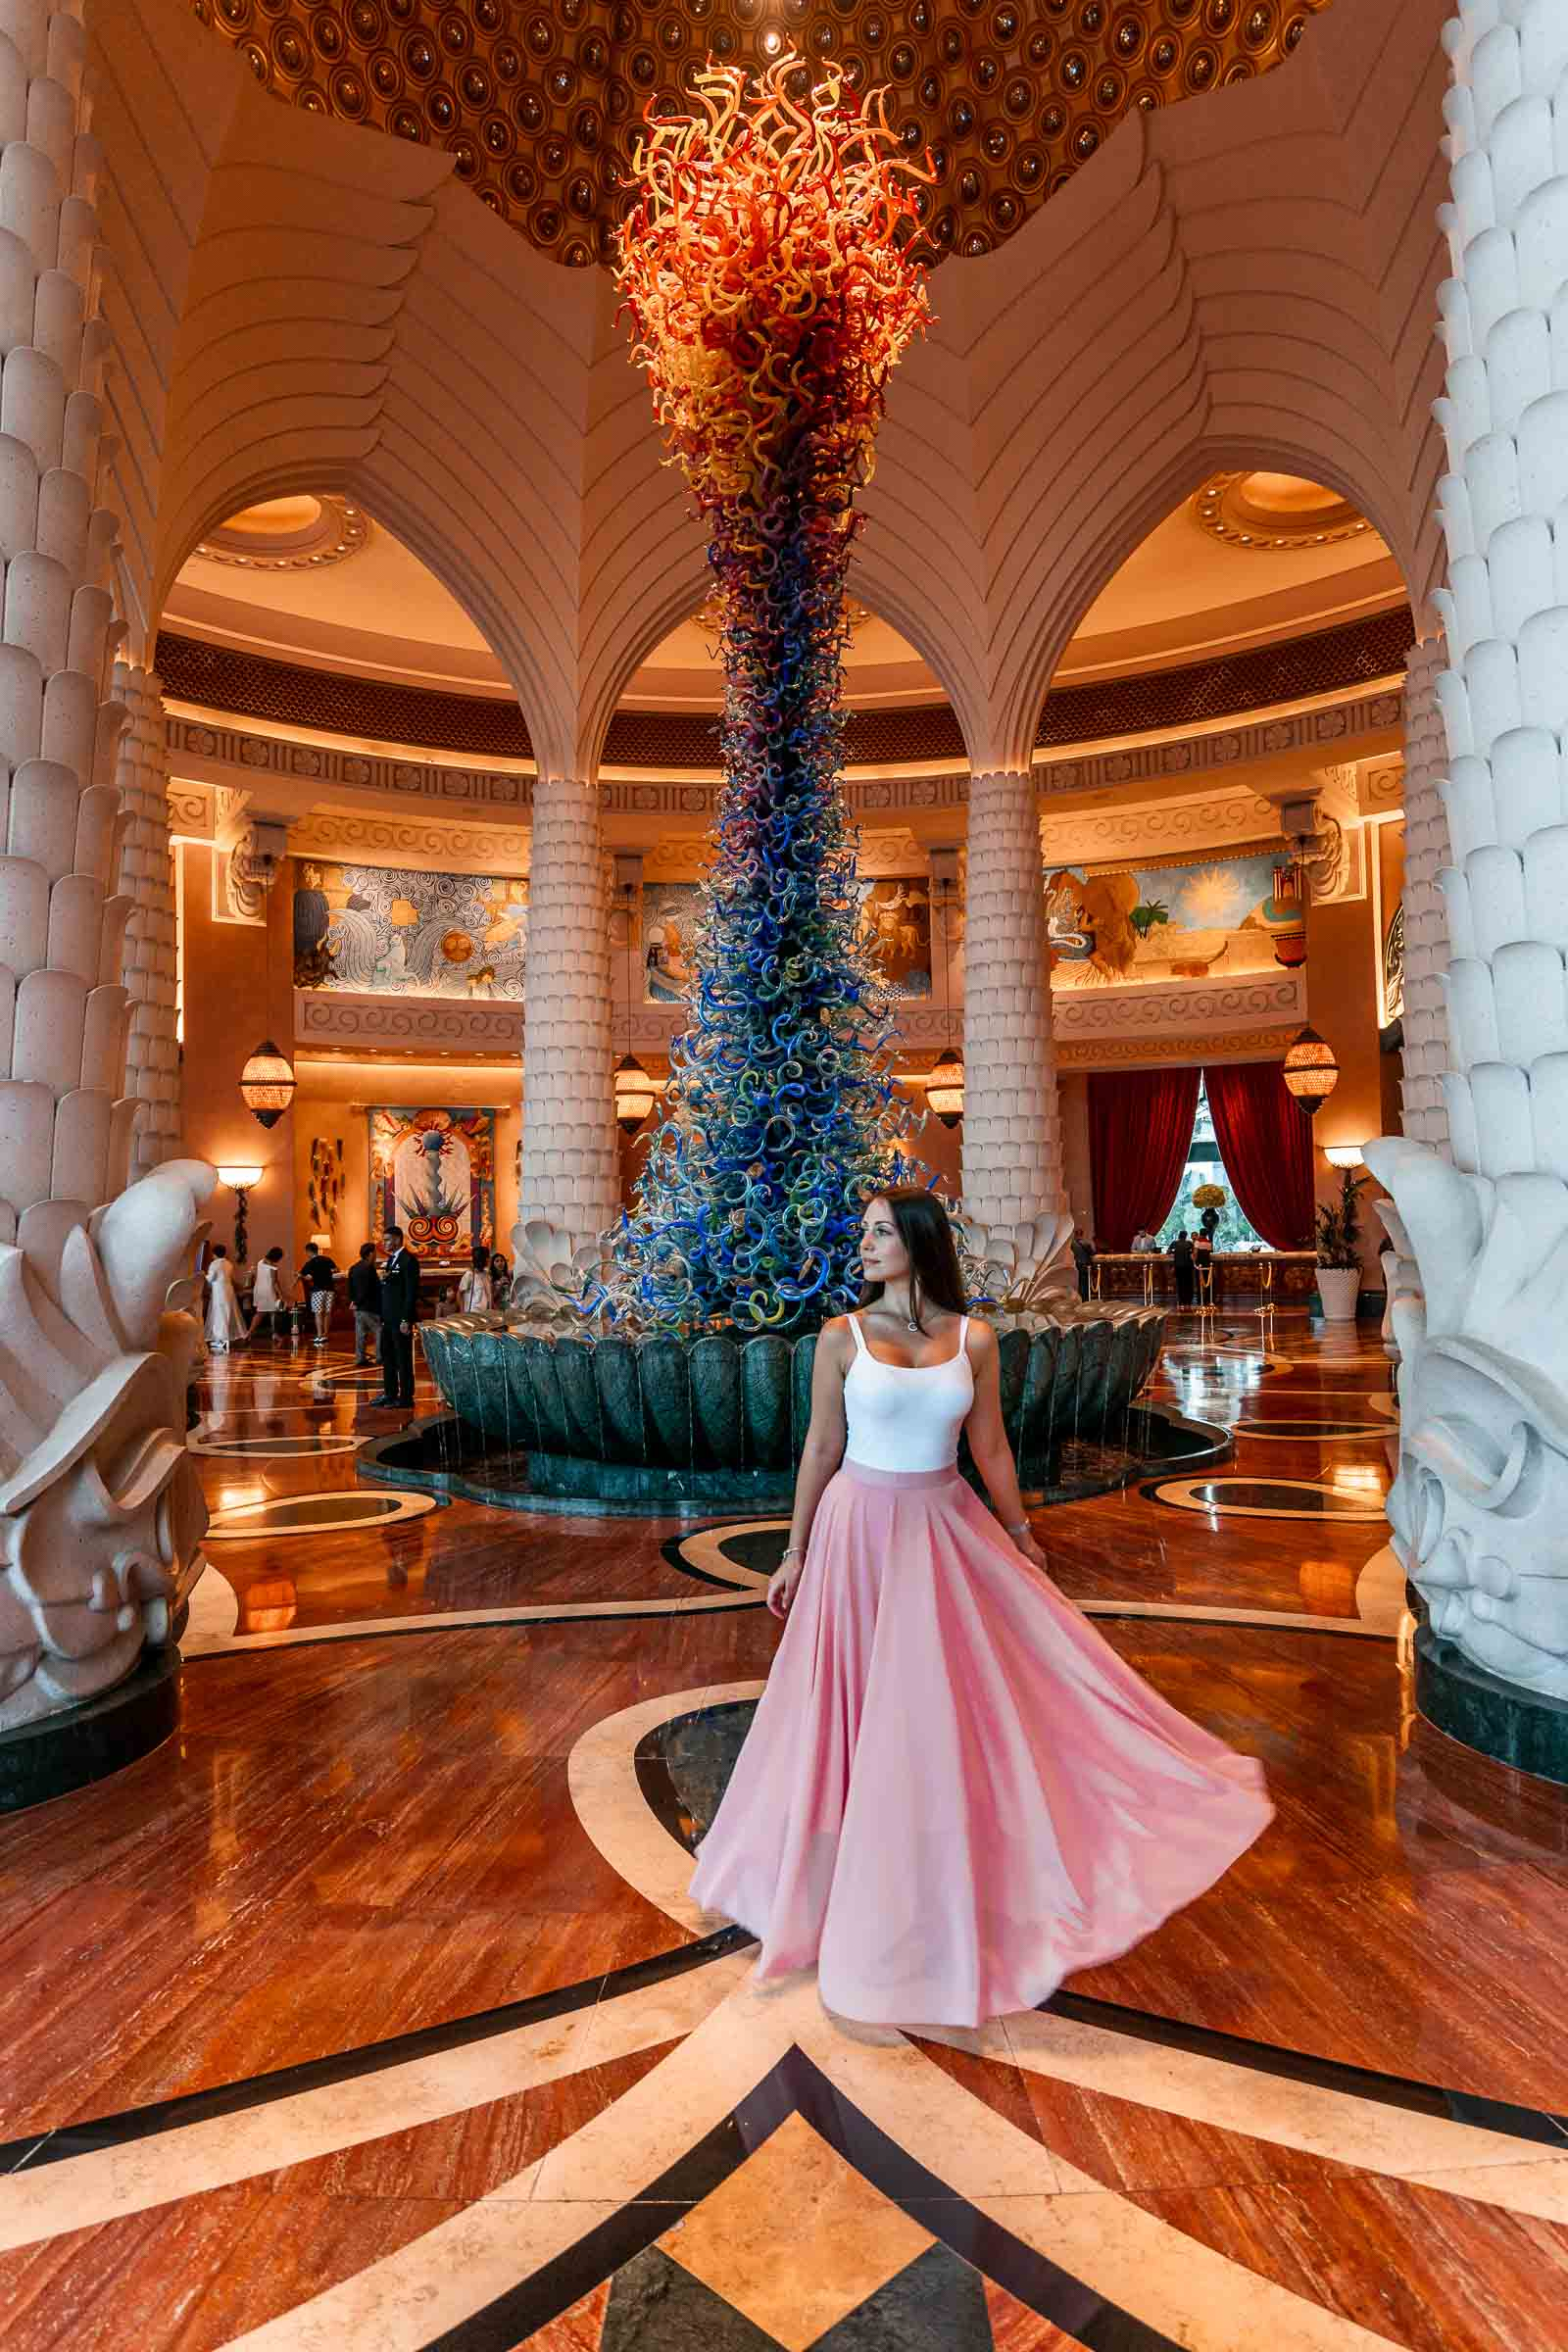 Girl in pink skirt standing in the lobby of the Atlantis hotel in Dubai